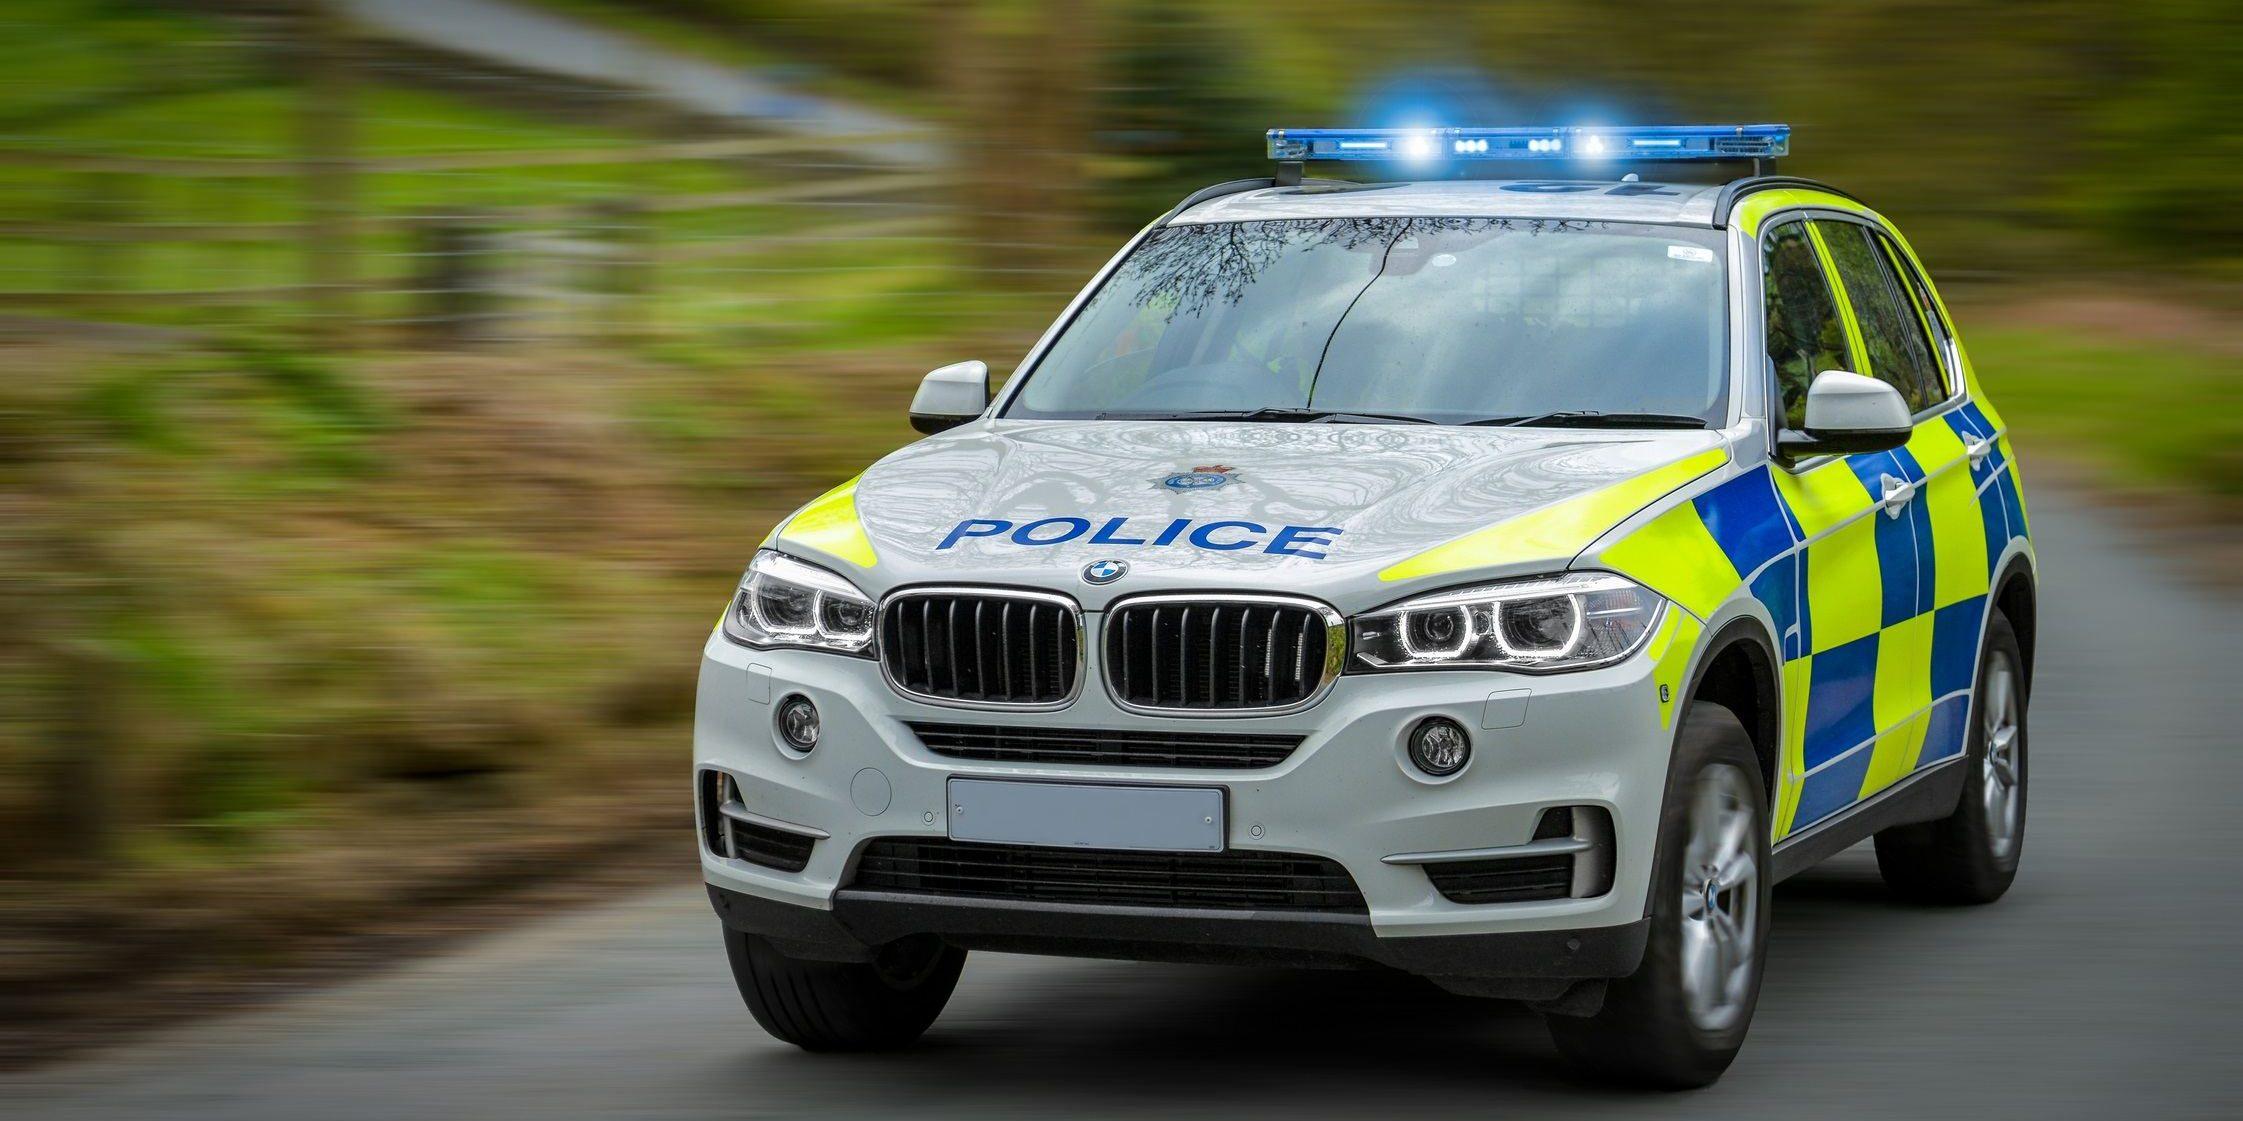 Police Case Study